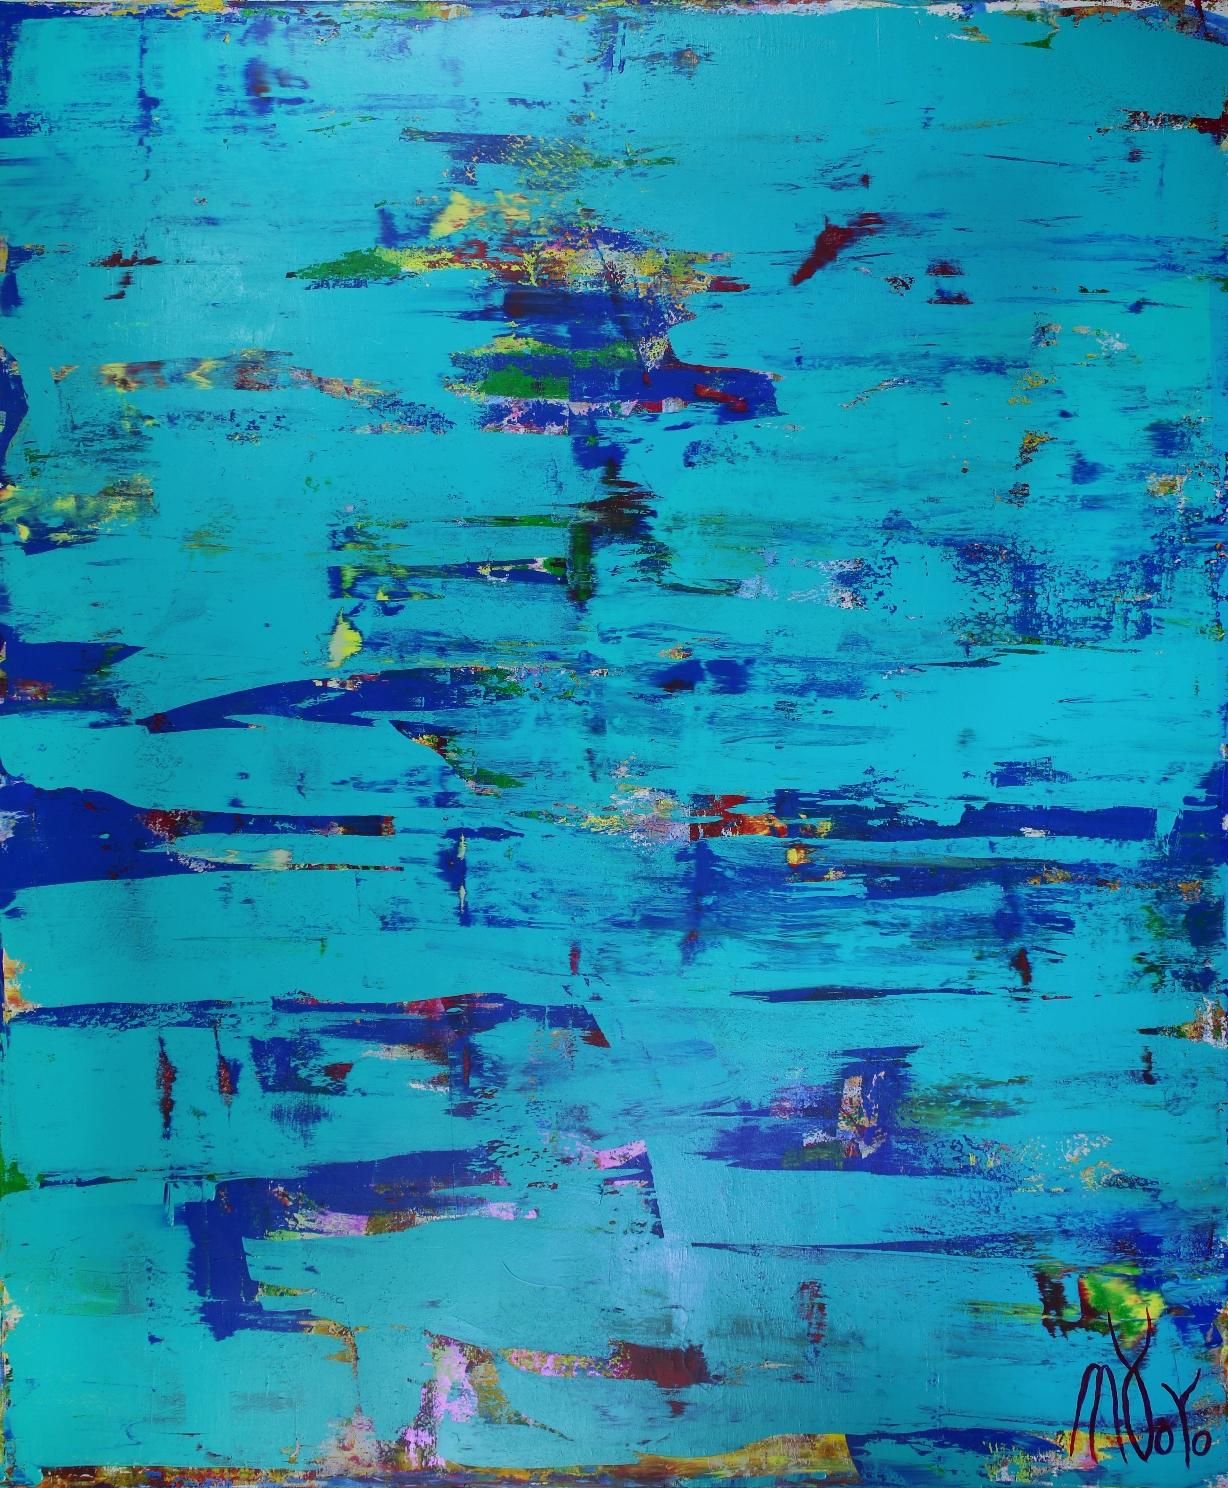 Blue (Coast Paradise) by Nestor Toro in Los Angeles 2019